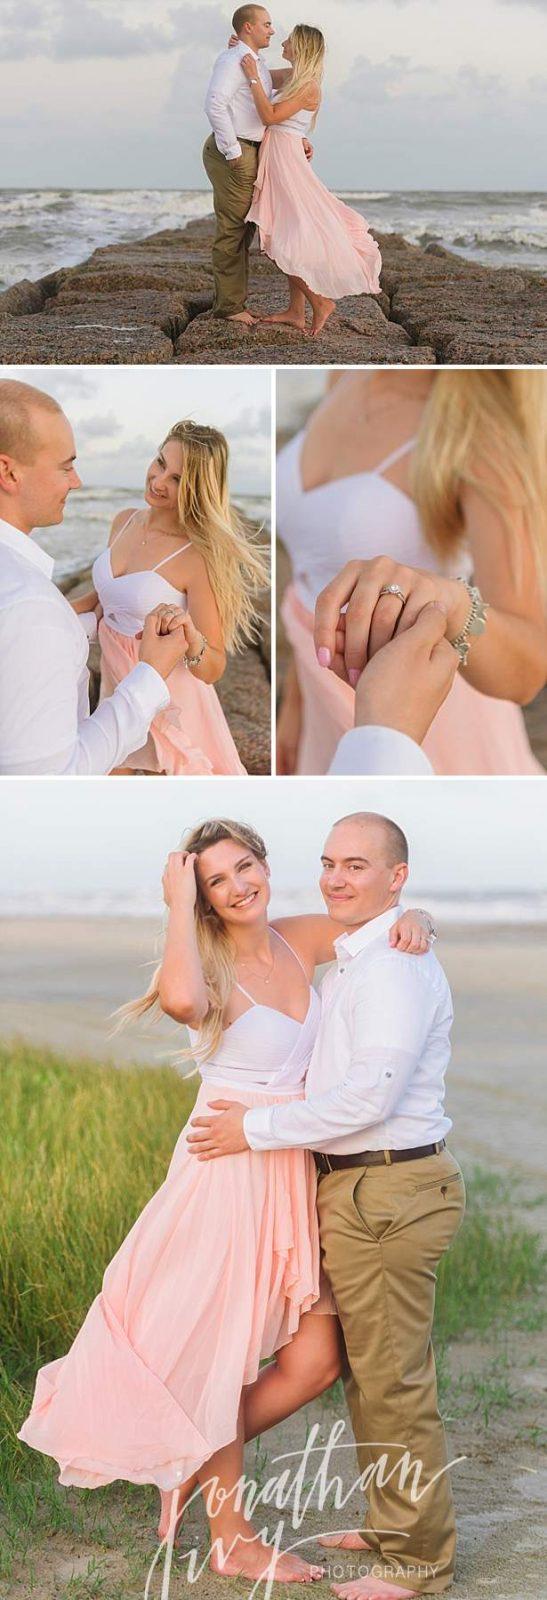 Romantic Beach Engagement Photos Galveston